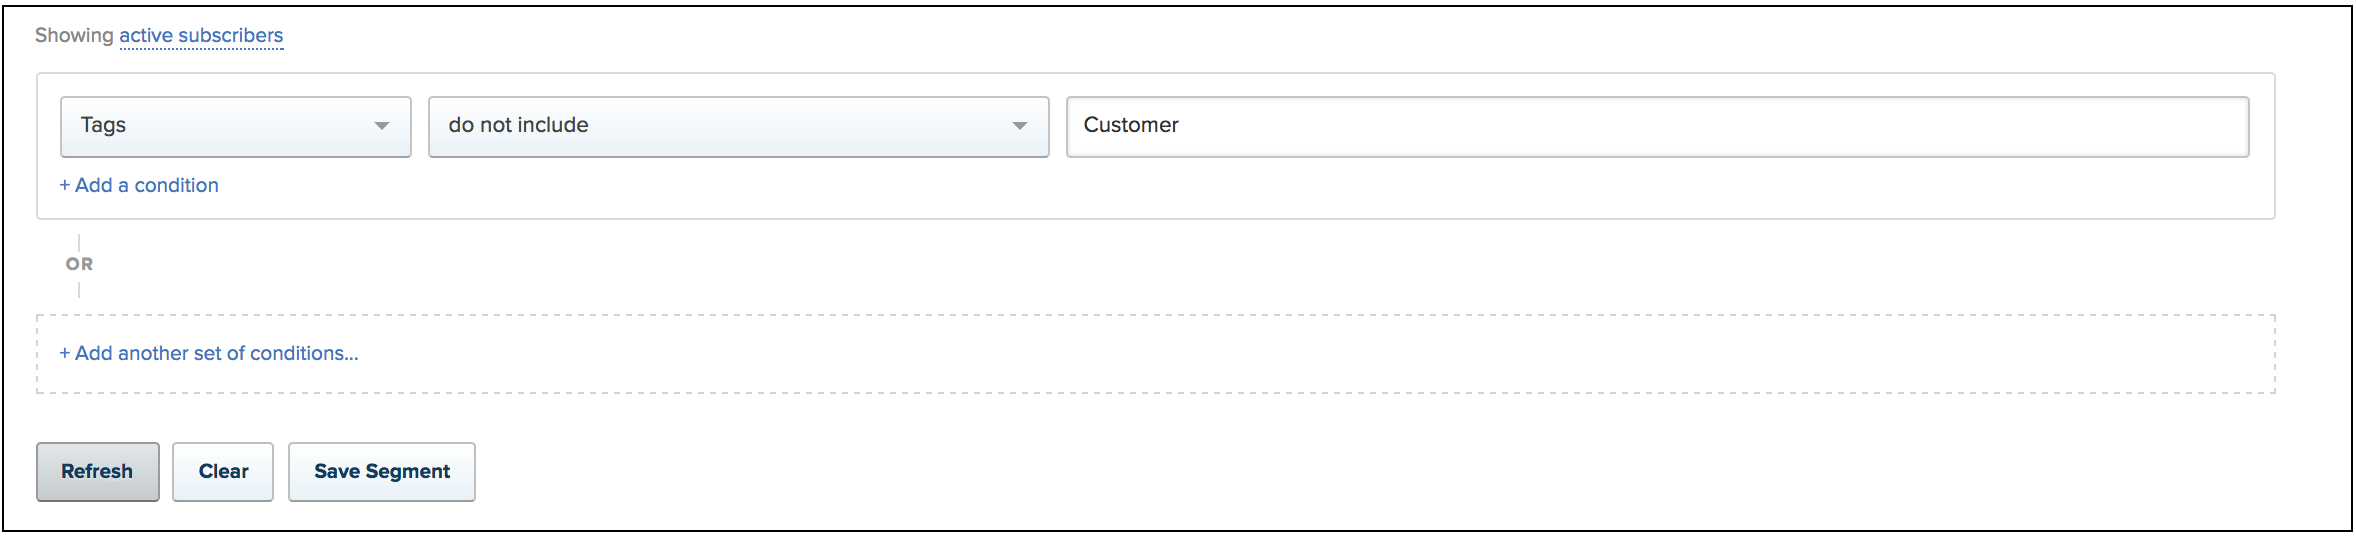 How To Make An Email Marketing Calendar